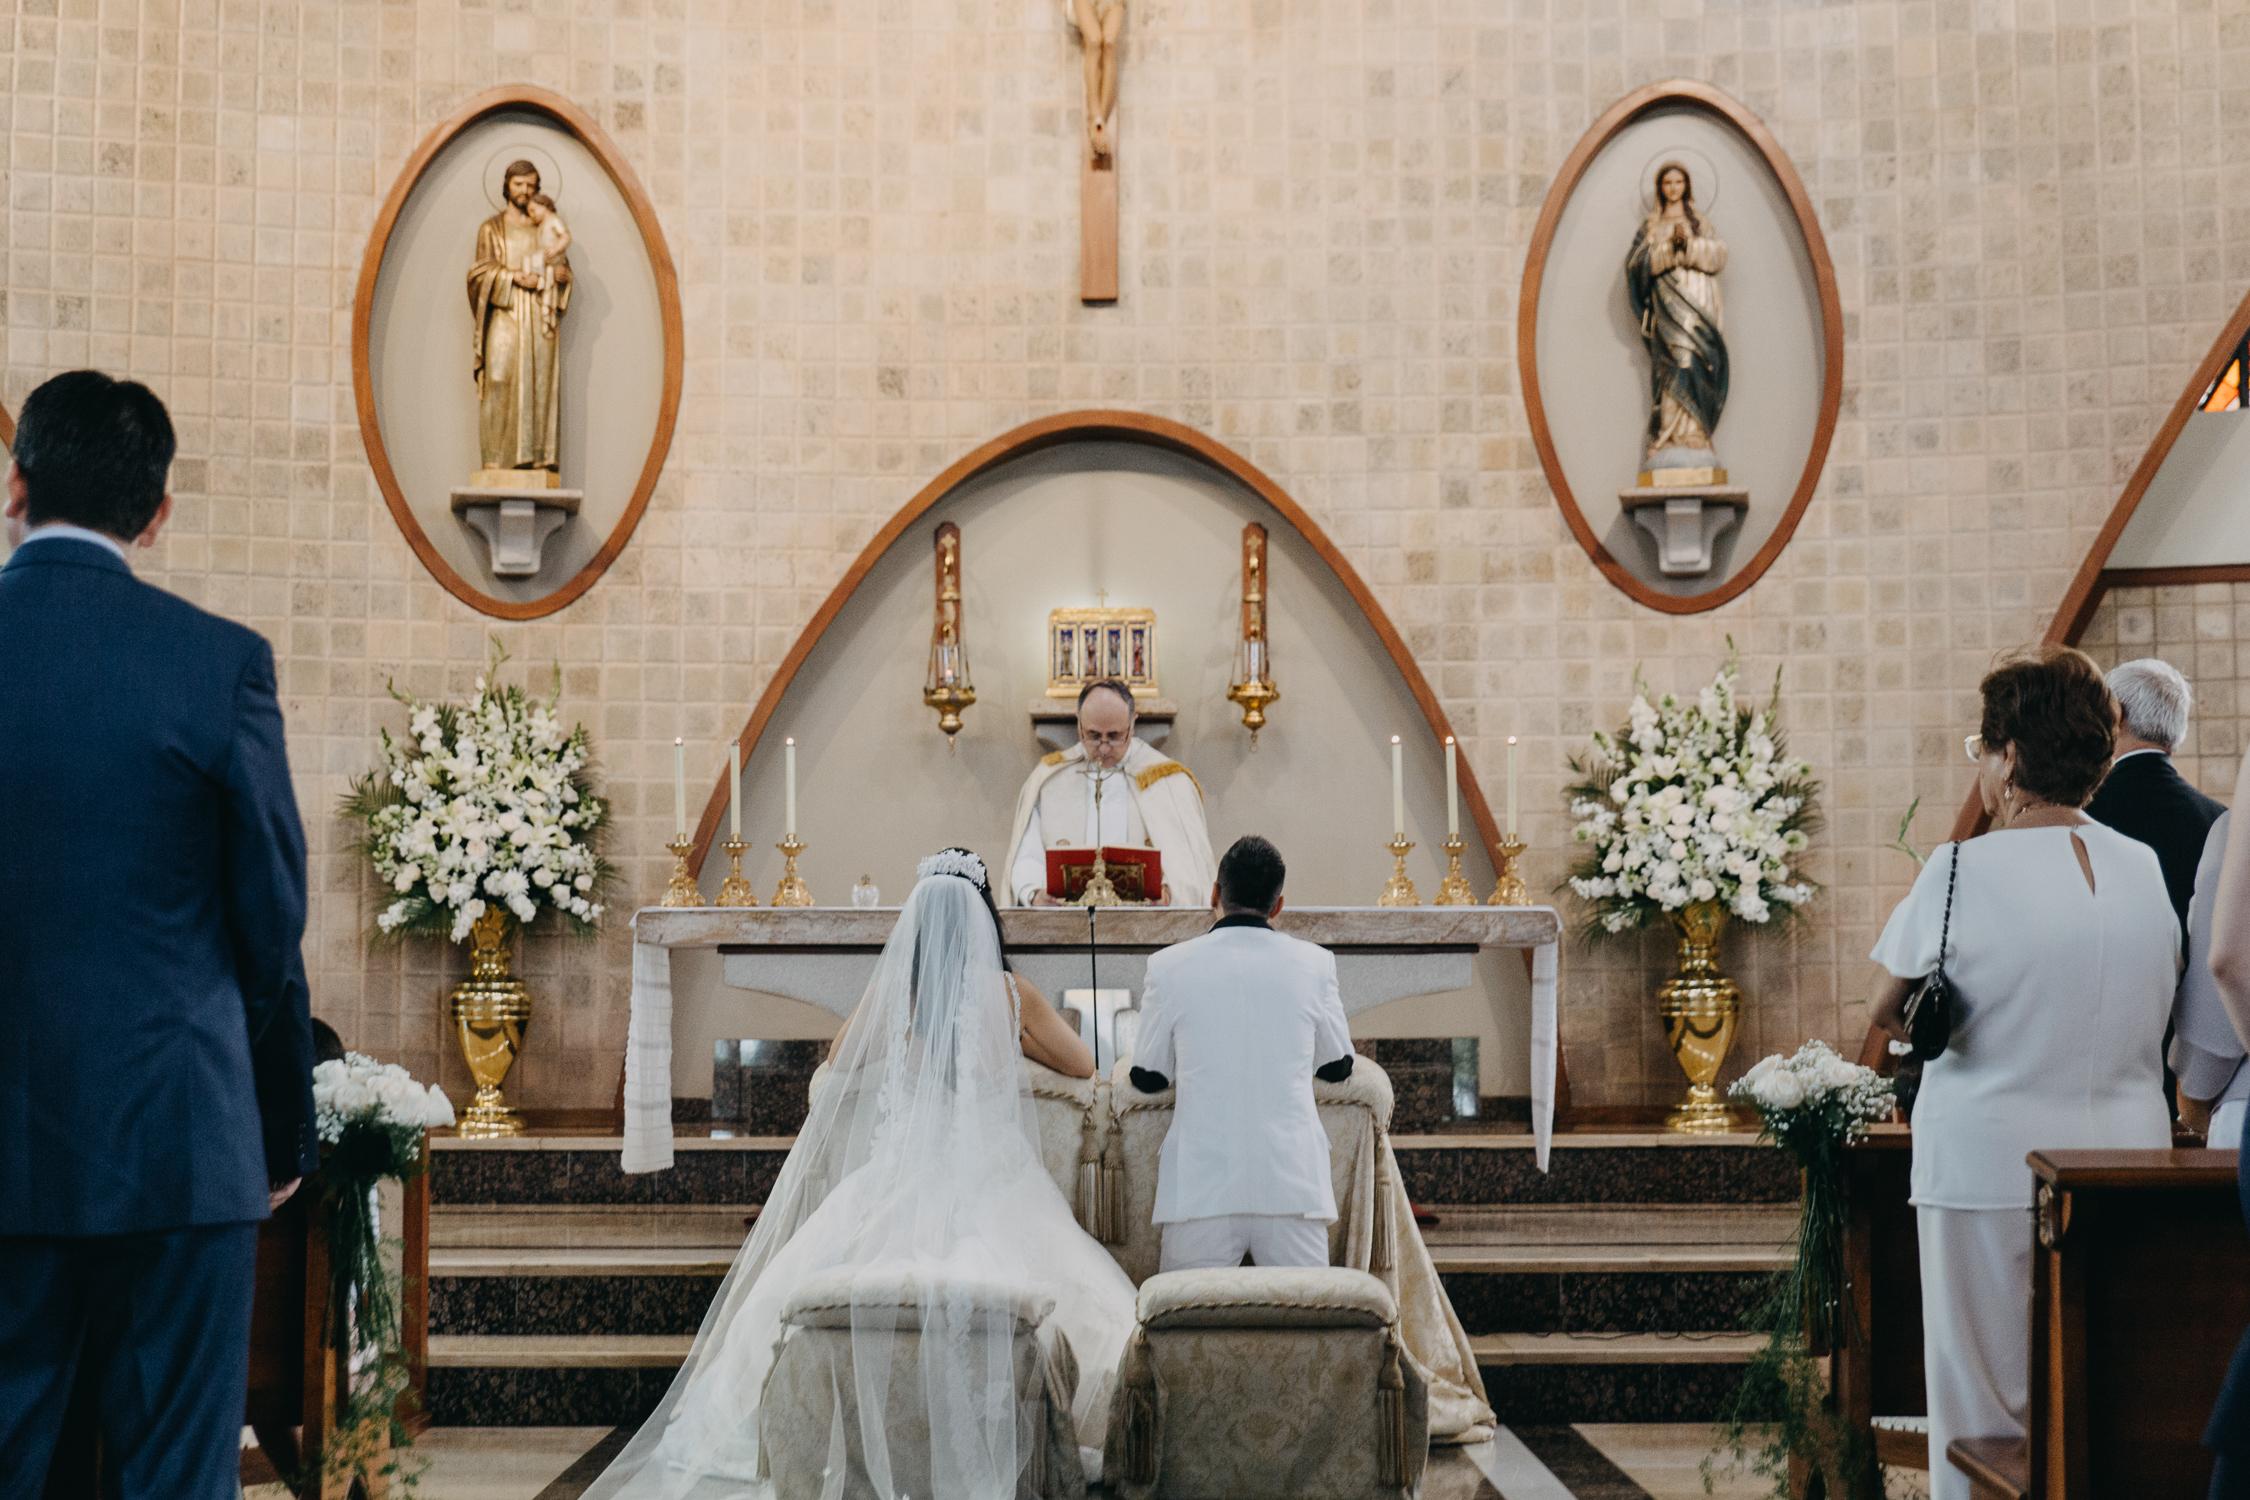 Michelle-Agurto-Fotografia-Bodas-Ecuador-Destination-Wedding-Photographer-Daniela-Dirk-12.JPG